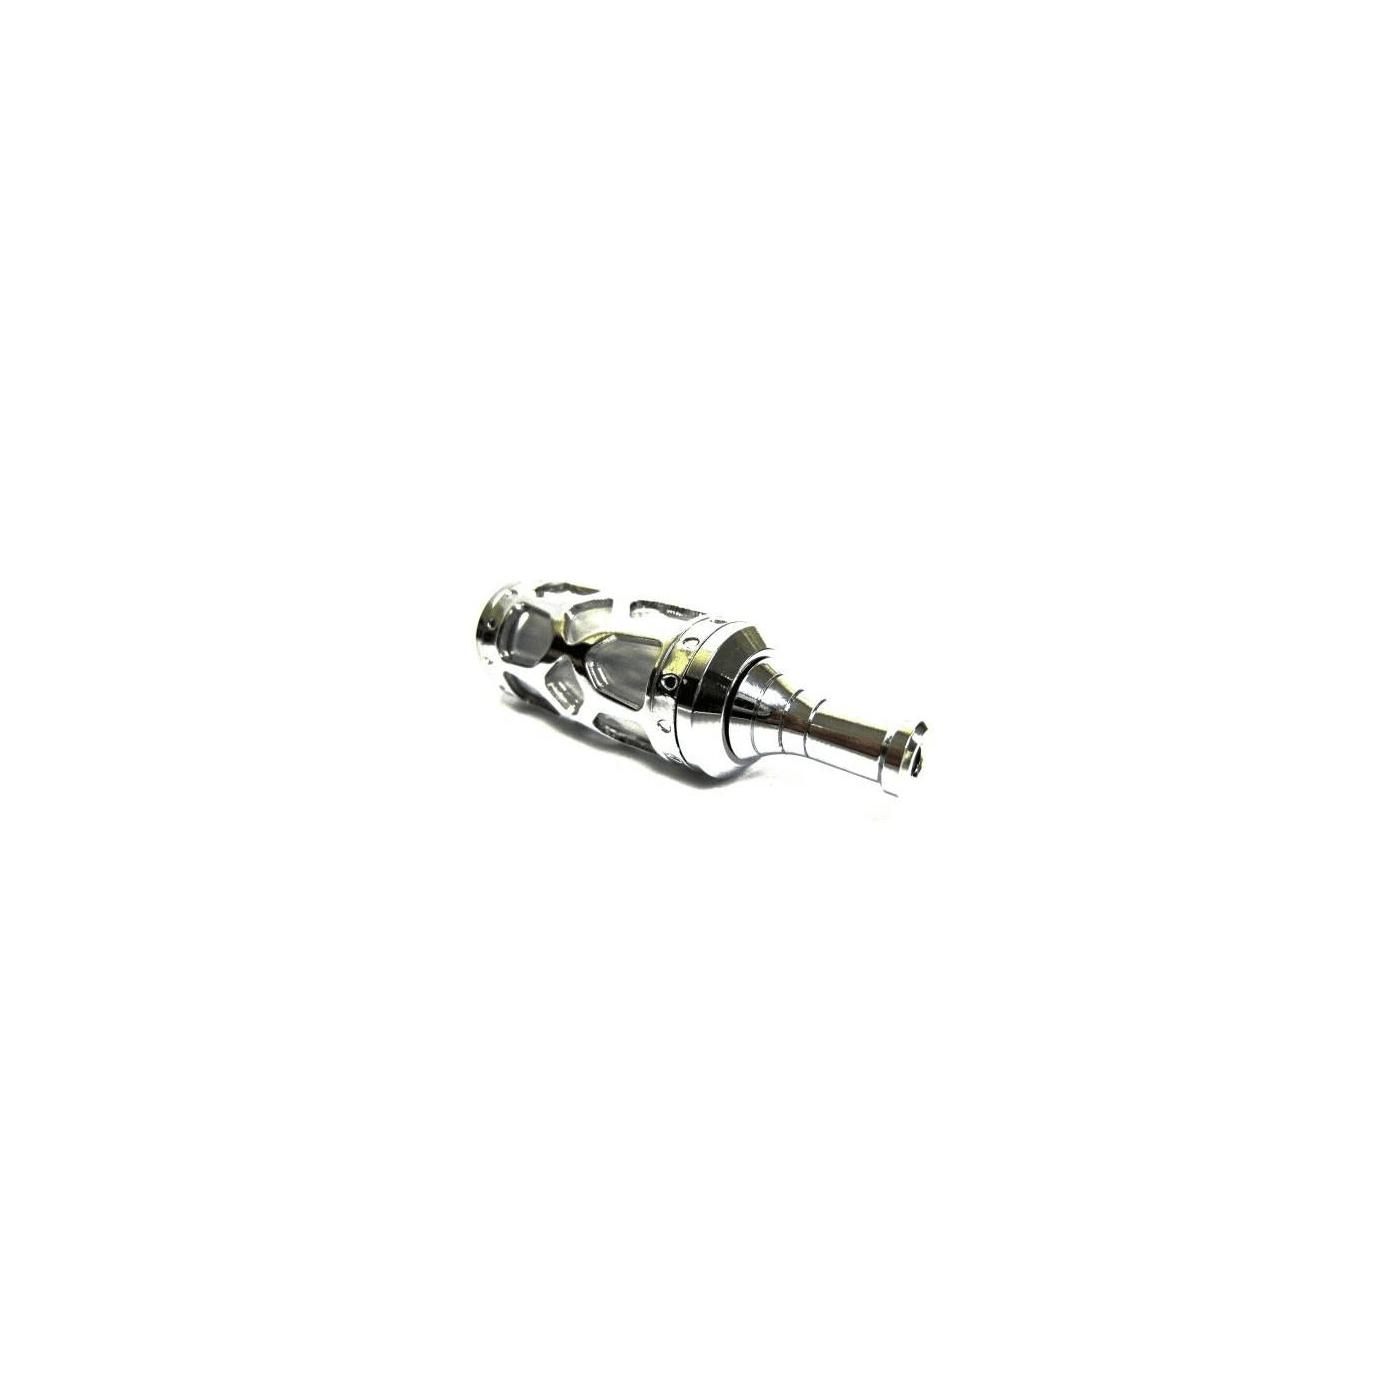 Raven Tank 1.8-2.4 Ohm – Polished